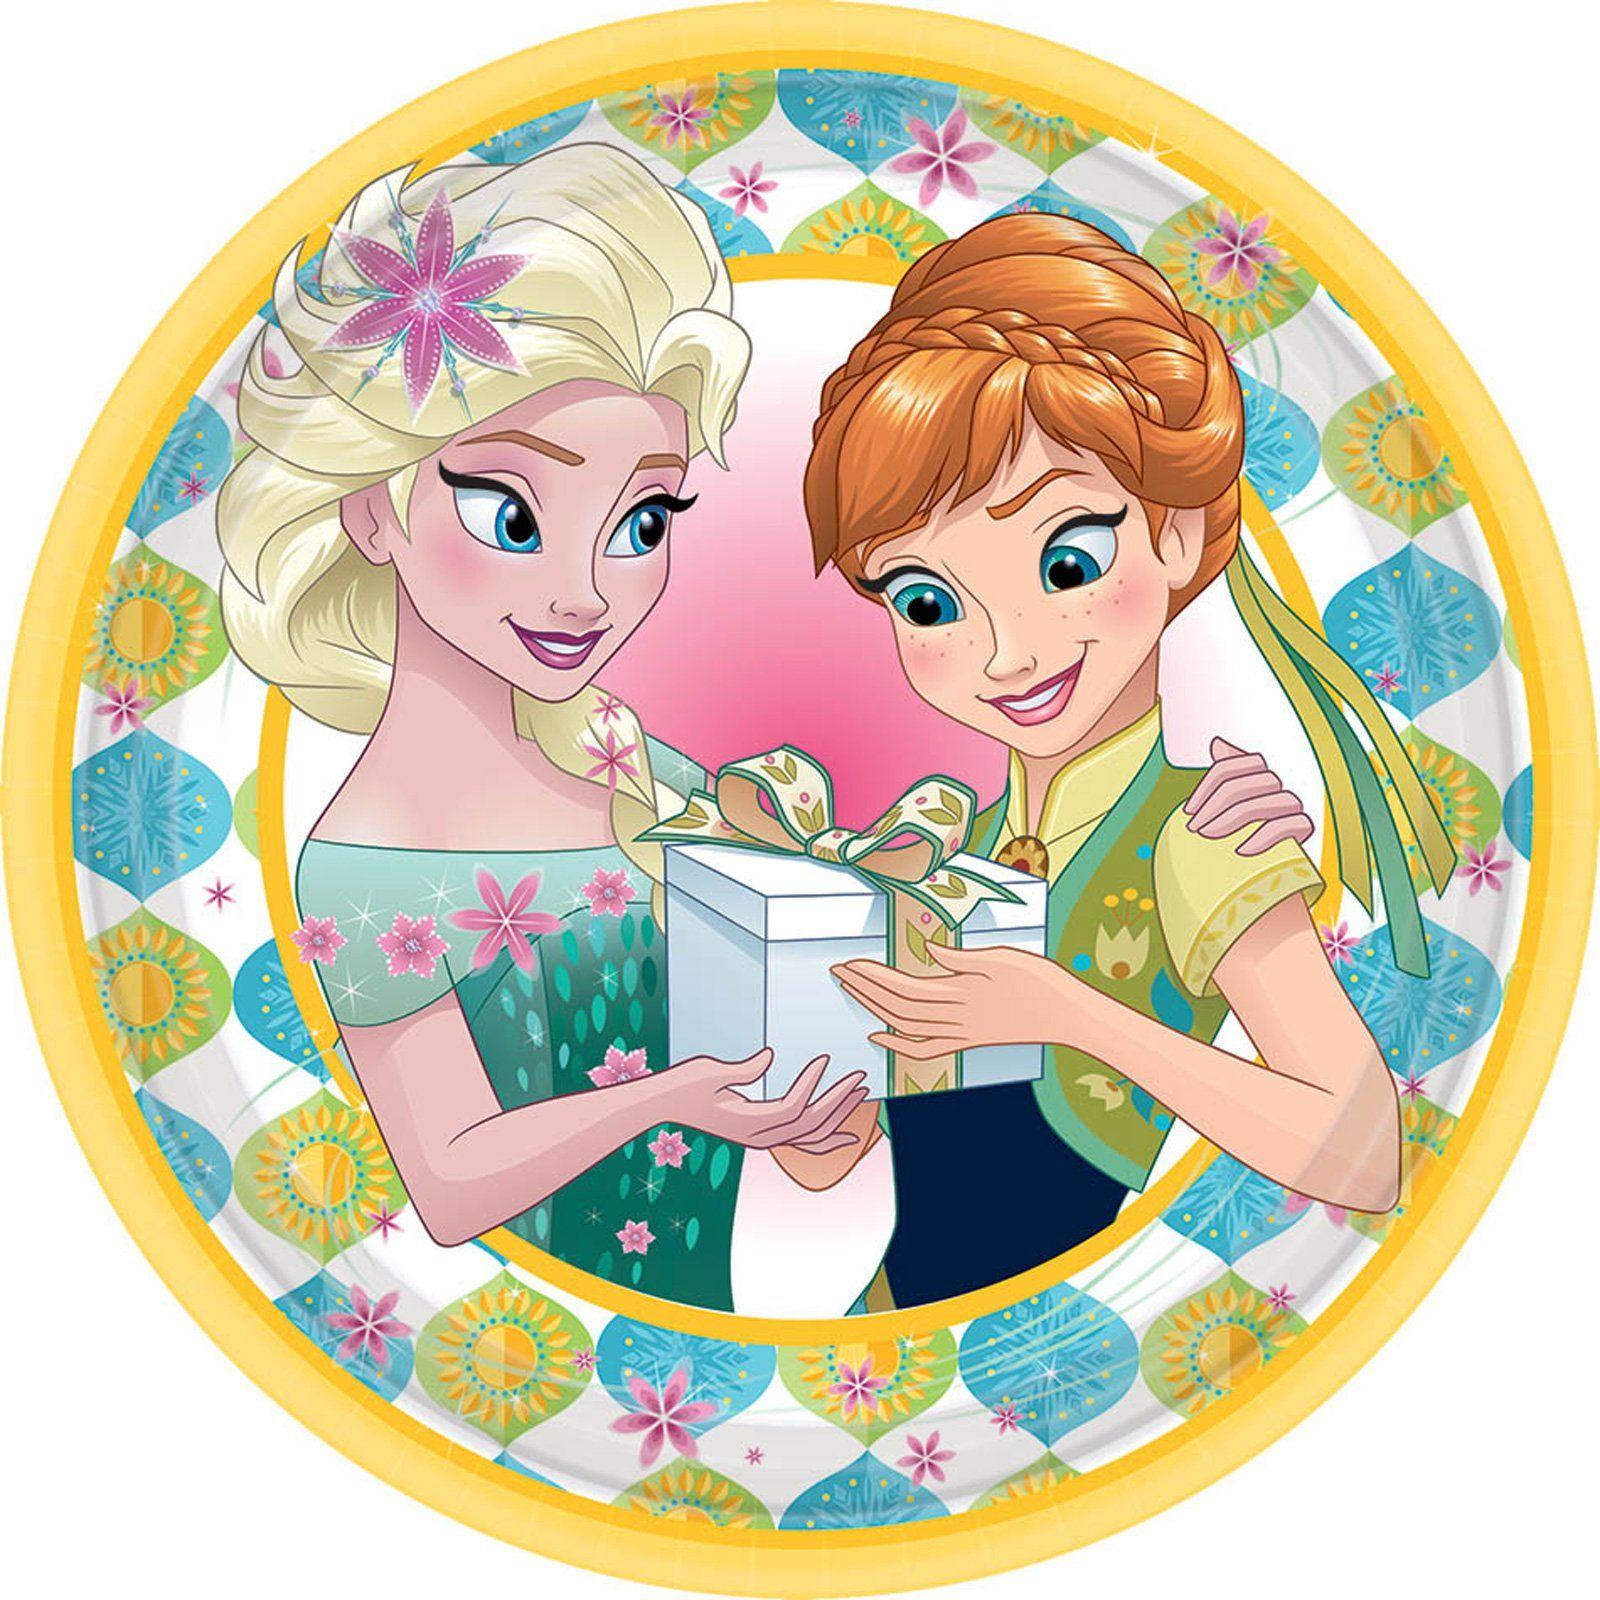 Disney Frozen Fever Dessert Plates